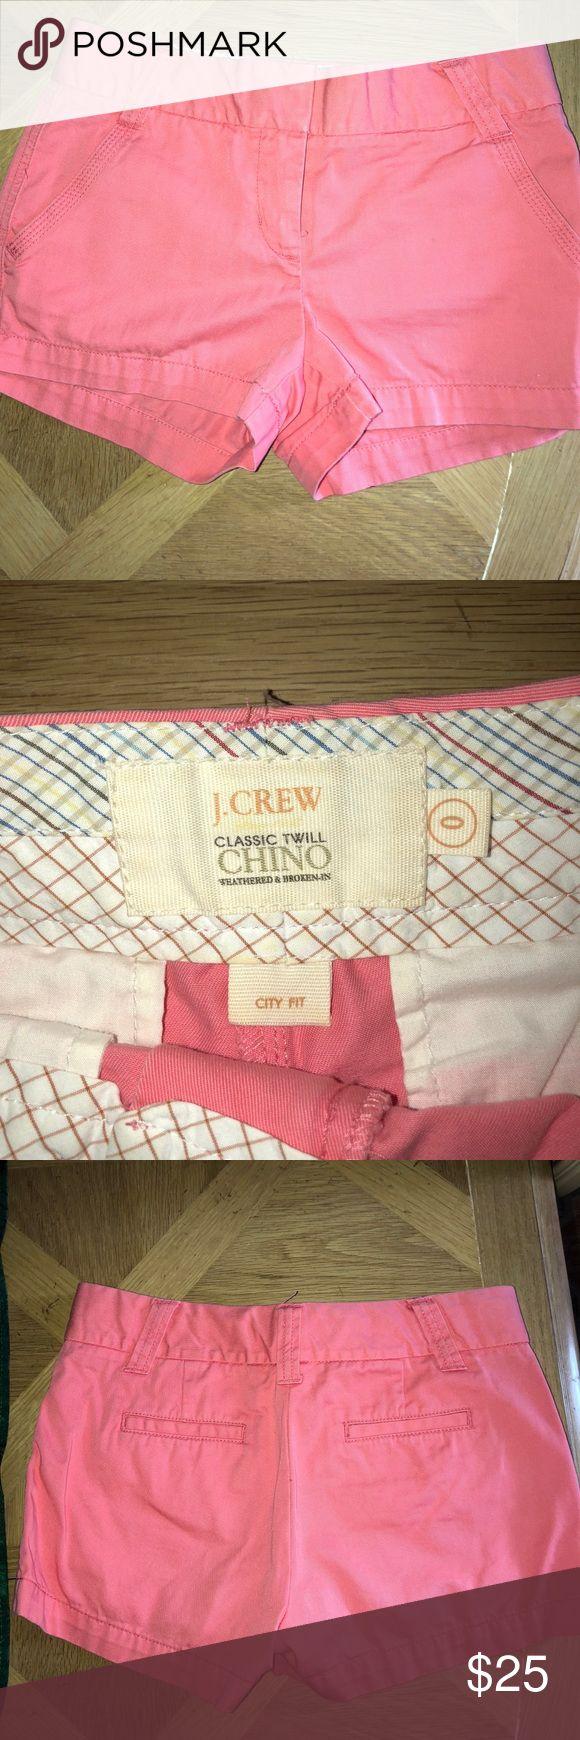 J. CREW Peach shorts- size 0 Size 0 Excellent condition J. Crew Shorts